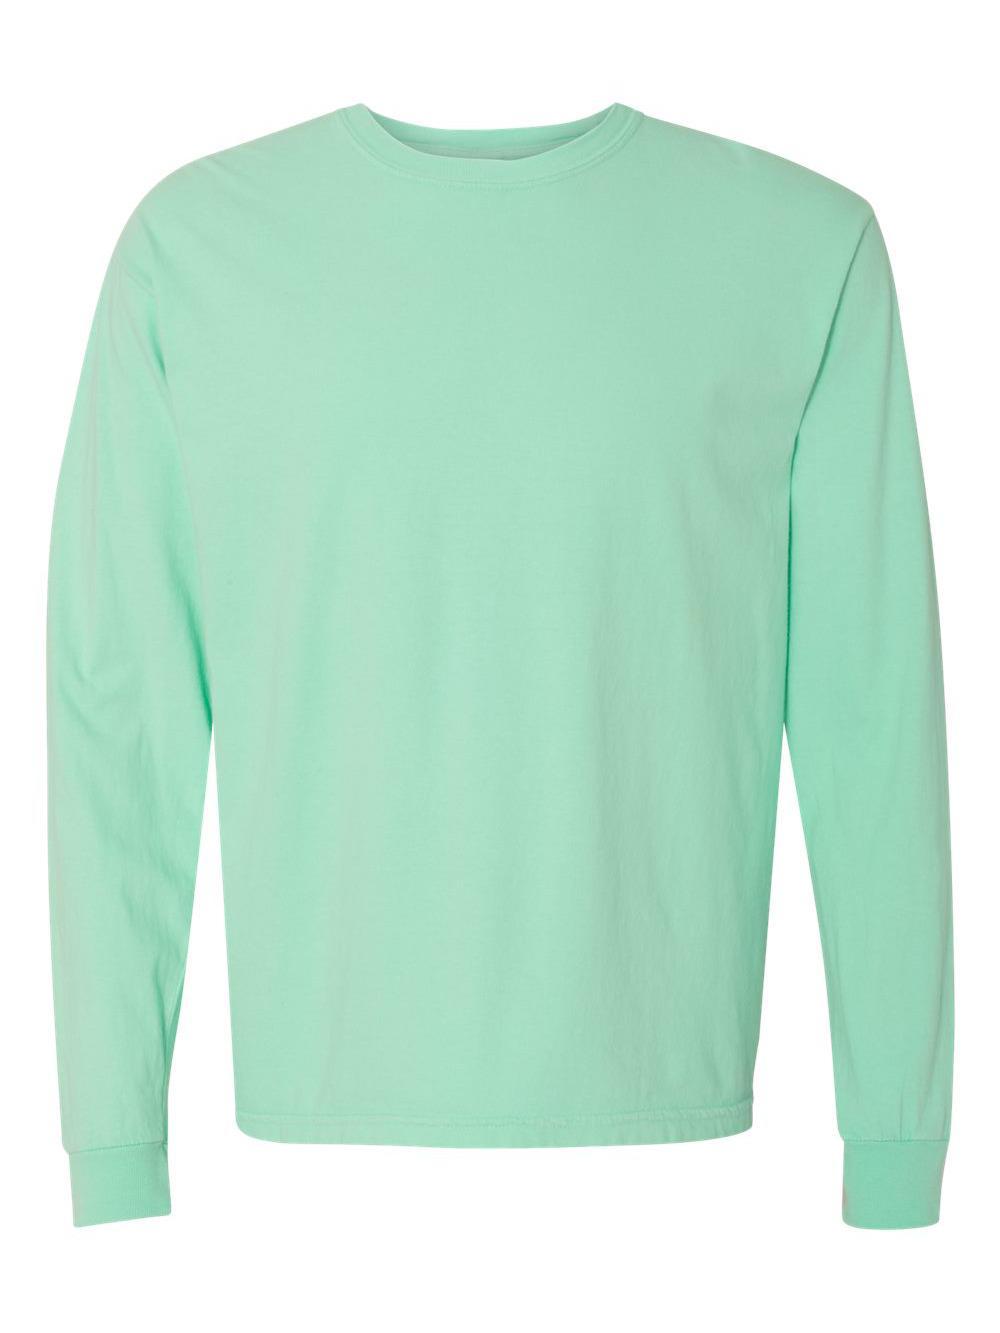 Comfort-Colors-Garment-Dyed-Heavyweight-Ringspun-Long-Sleeve-T-Shirt-6014 thumbnail 42